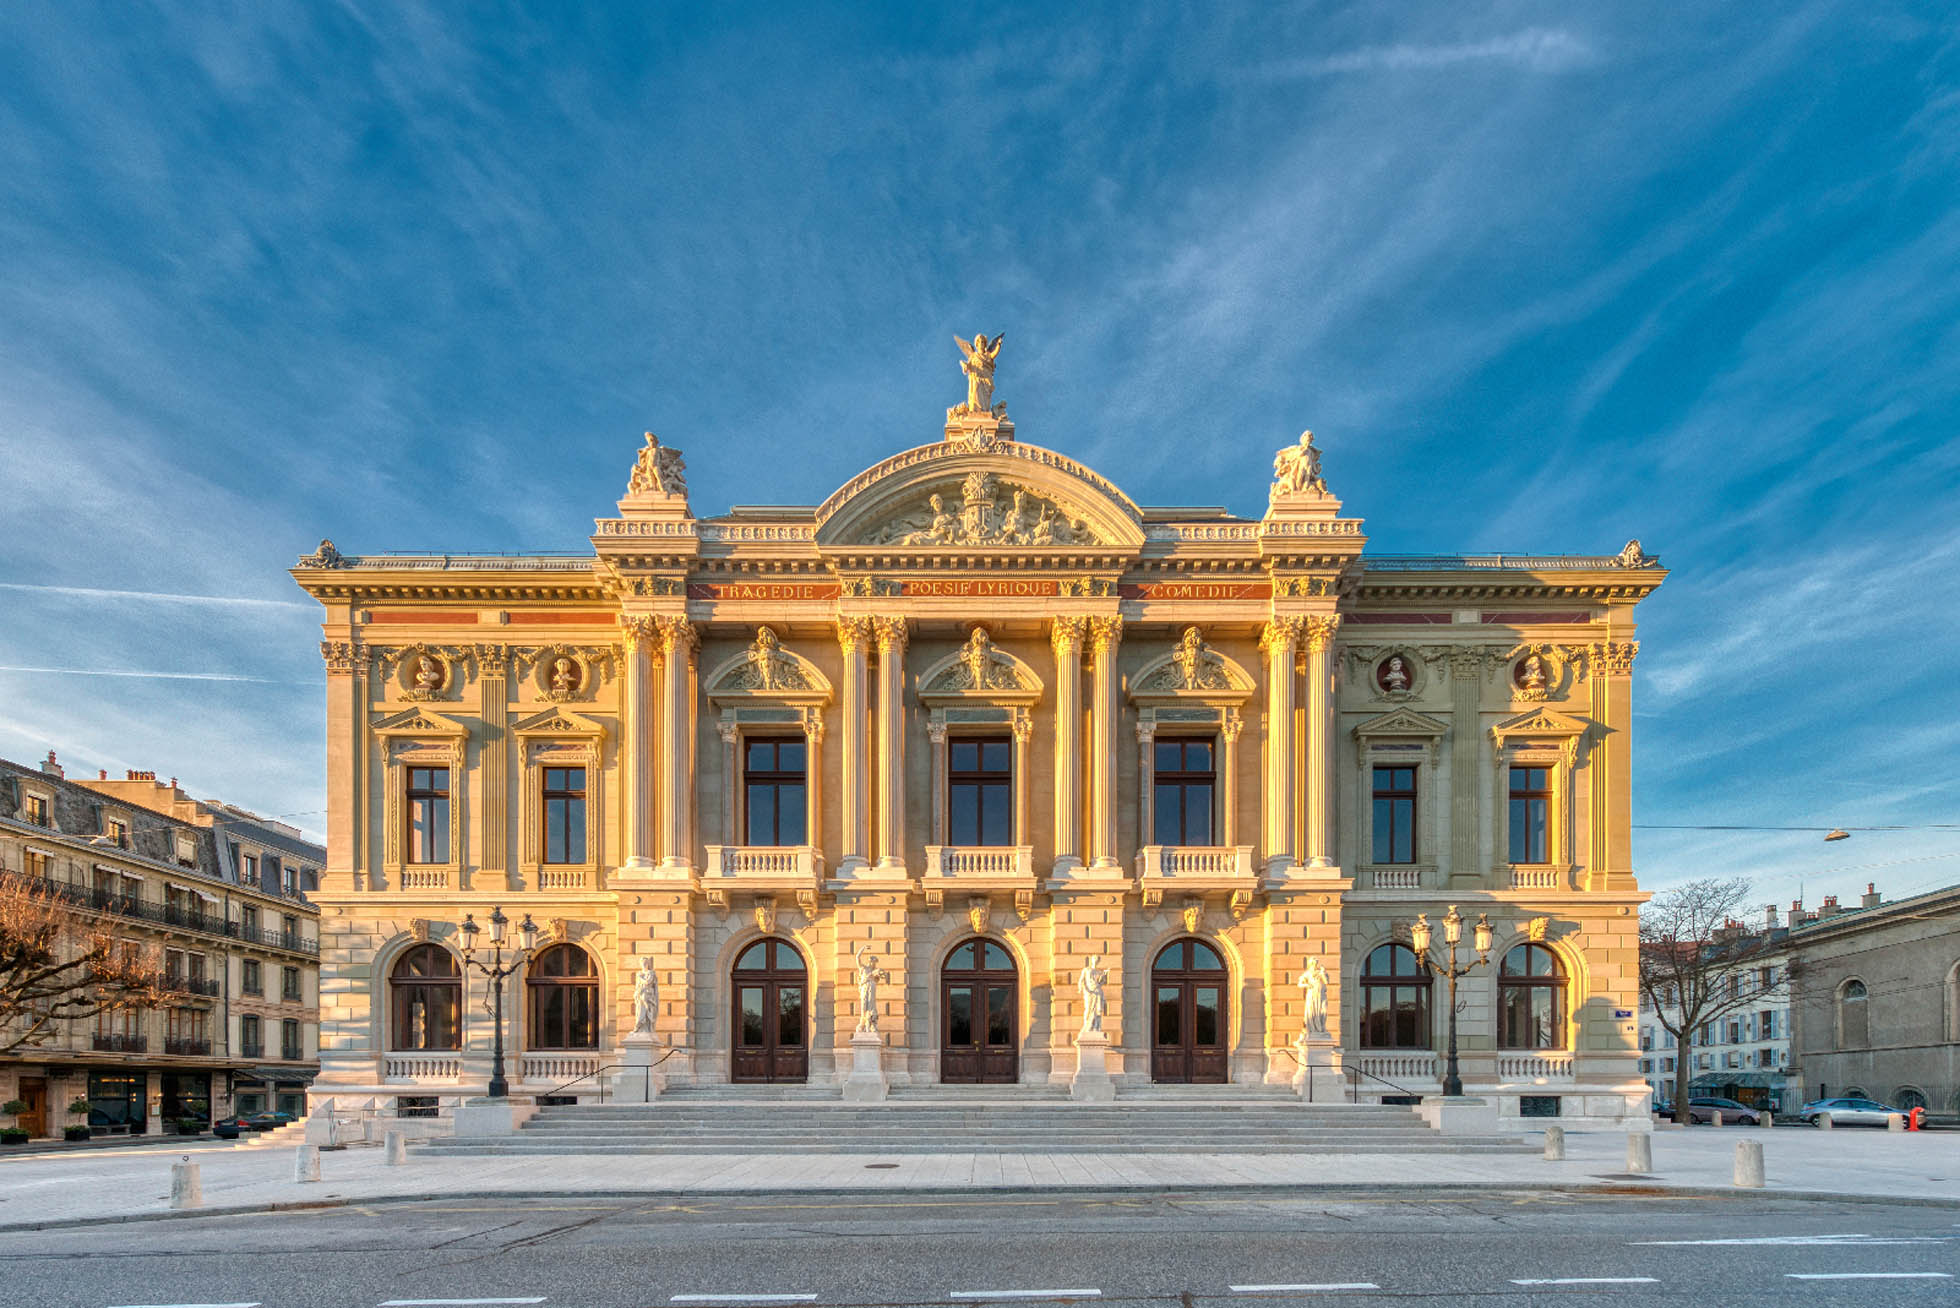 façade opéra grand théâtre de genève